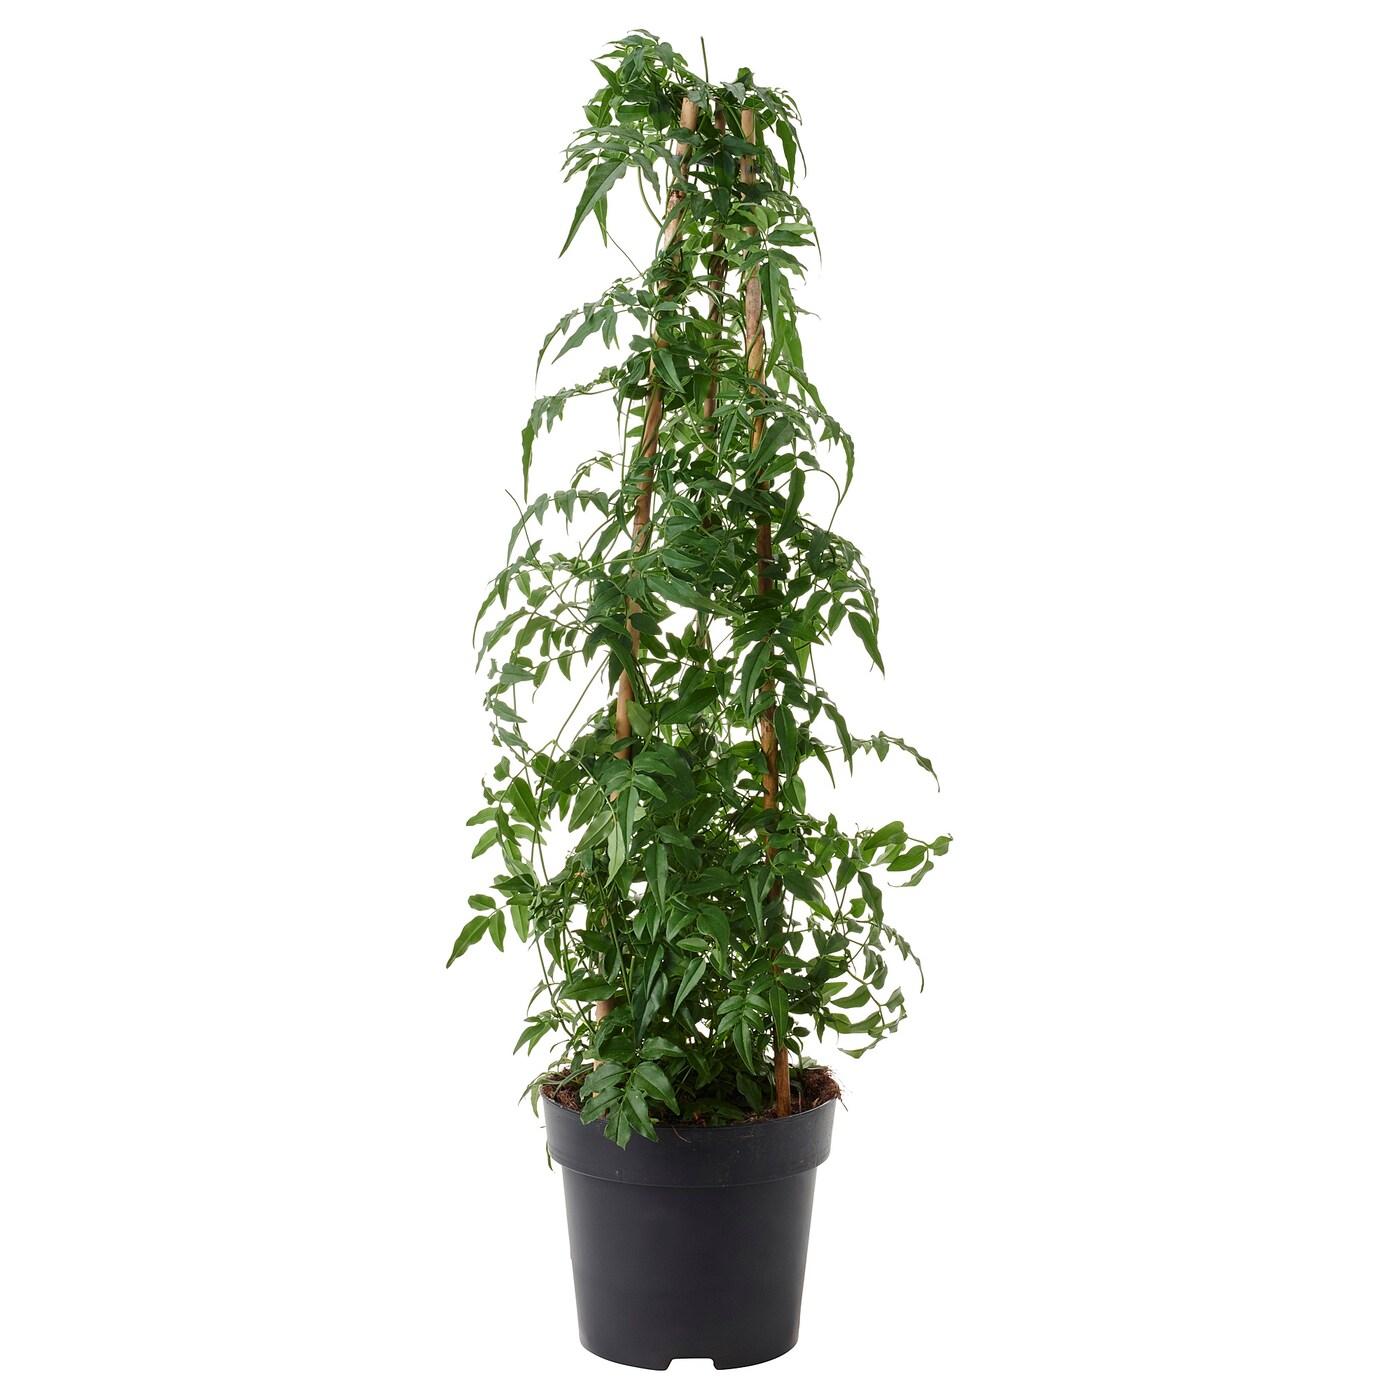 jasminum potted plant jasmine 17 cm ikea. Black Bedroom Furniture Sets. Home Design Ideas